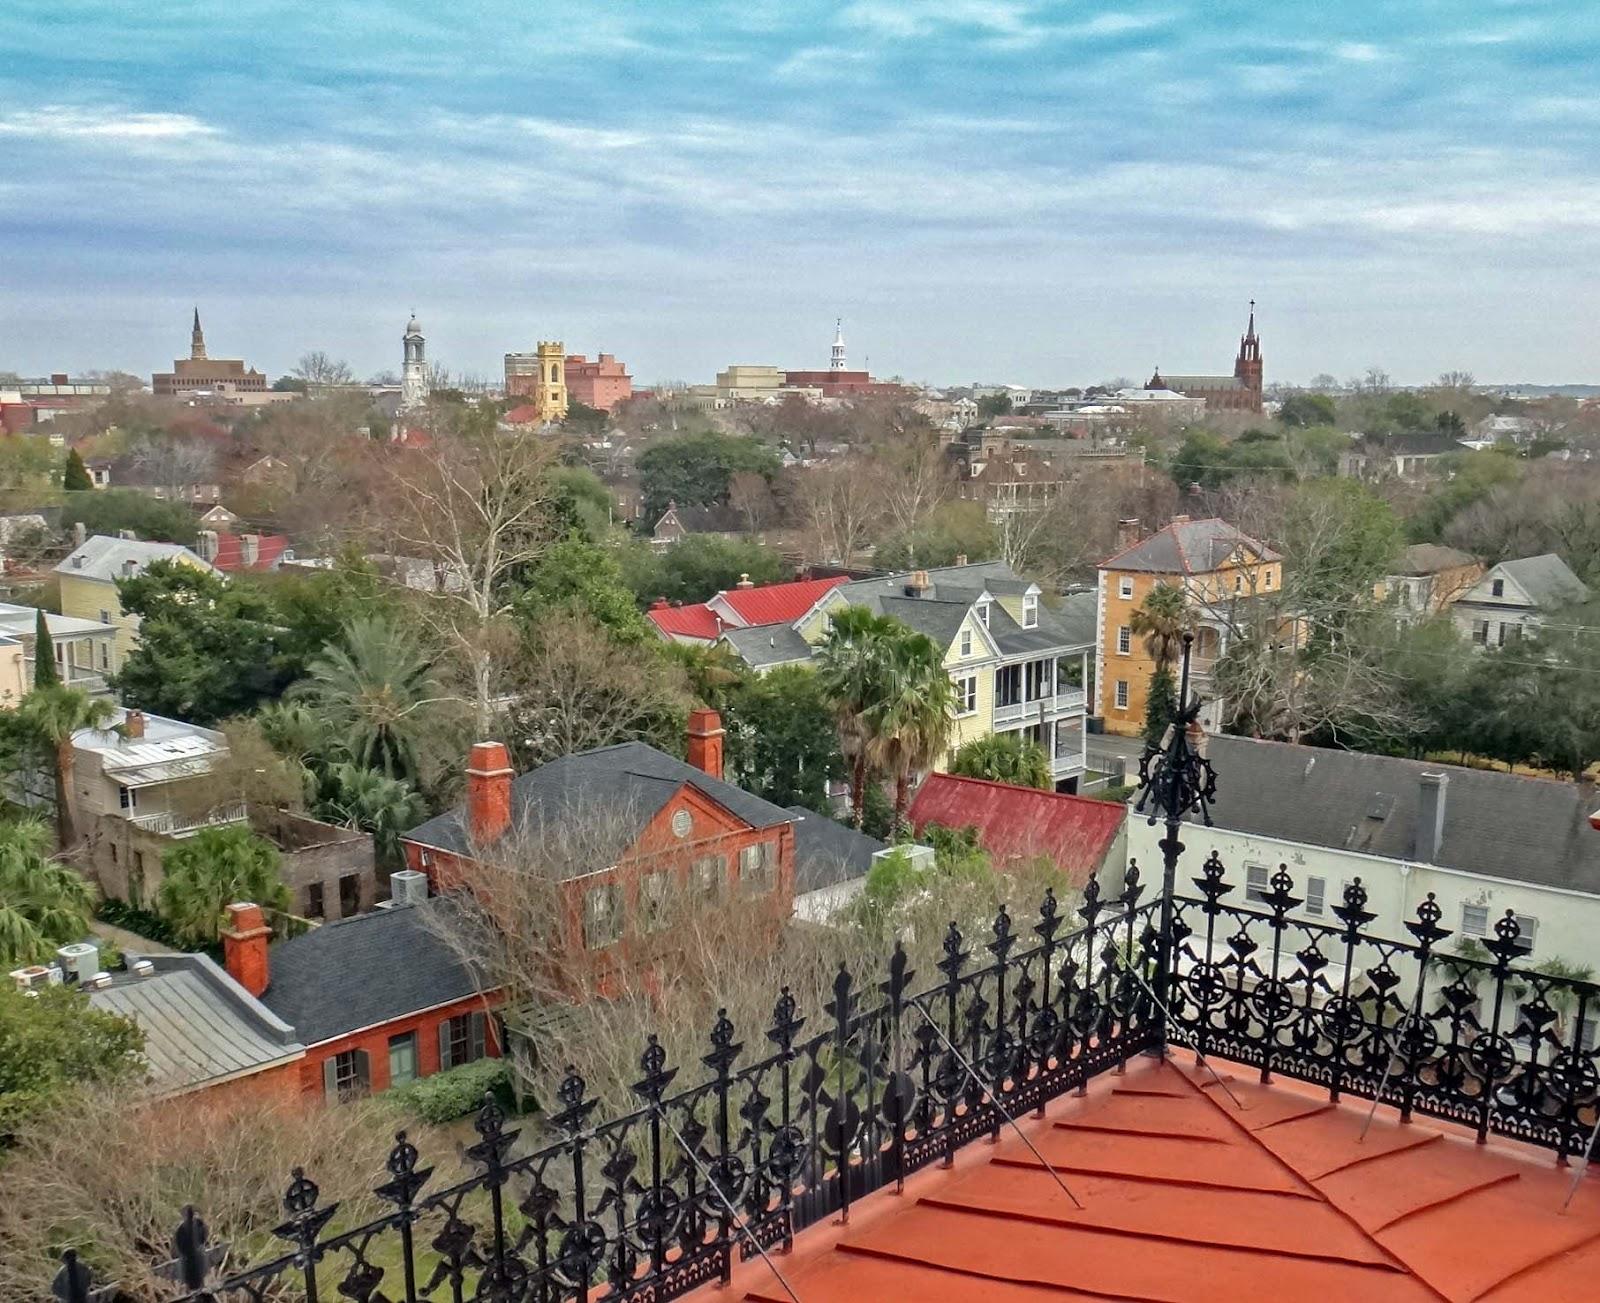 Joe S Retirement Blog Wentworth Mansion Charleston